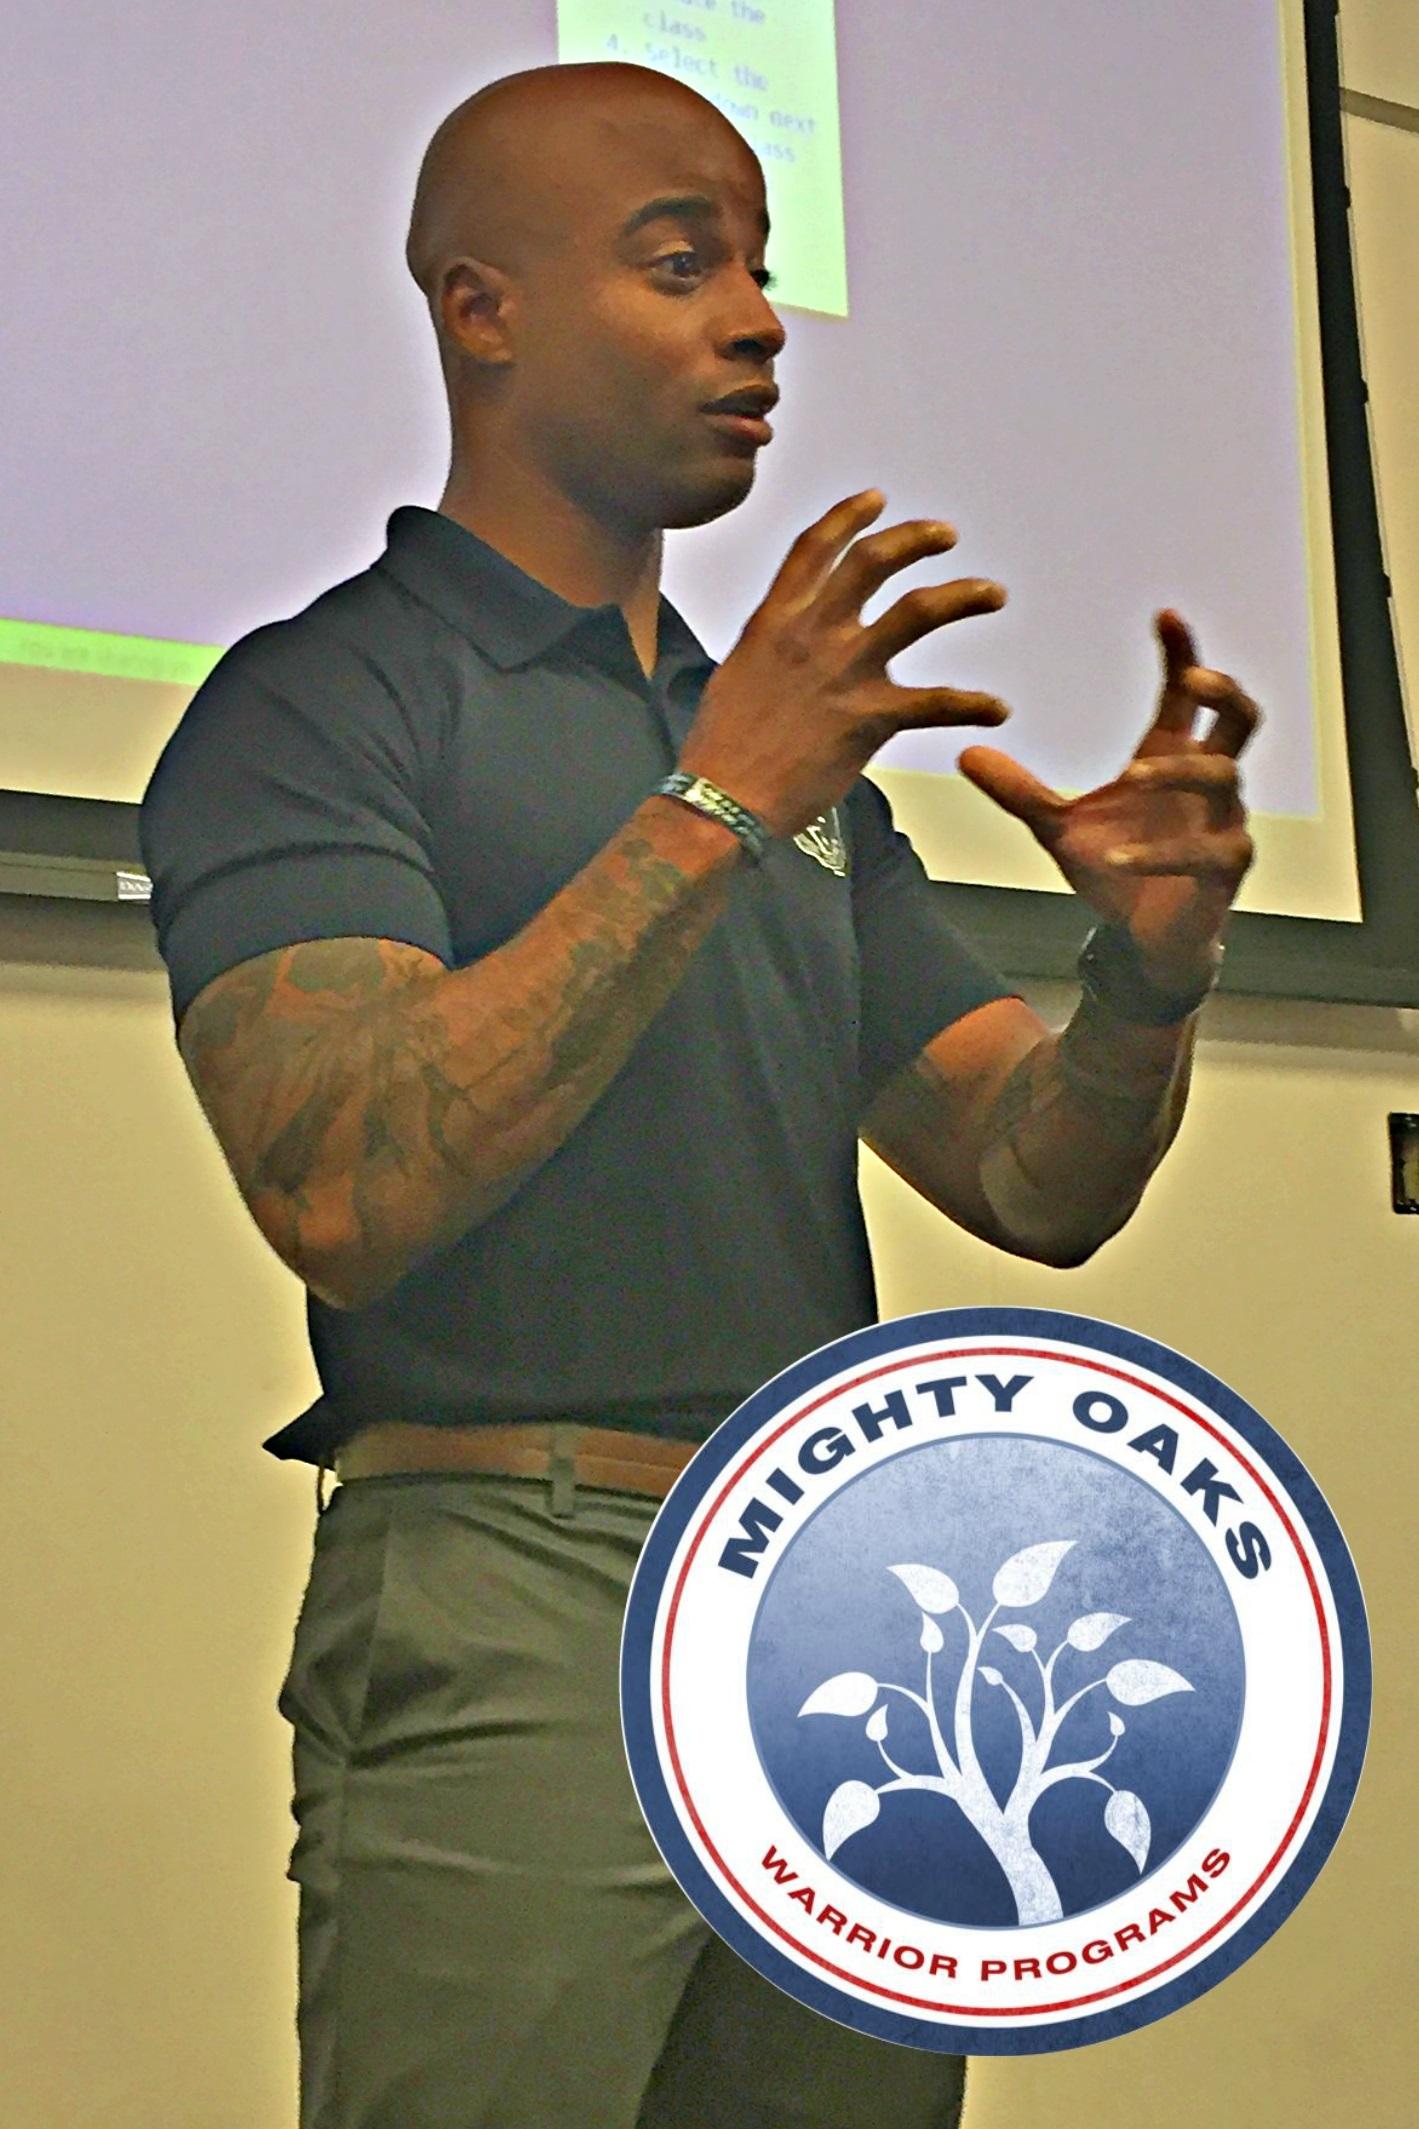 Mighty Oaks Warrior Programs Briefs Trademark Managers on PTSD